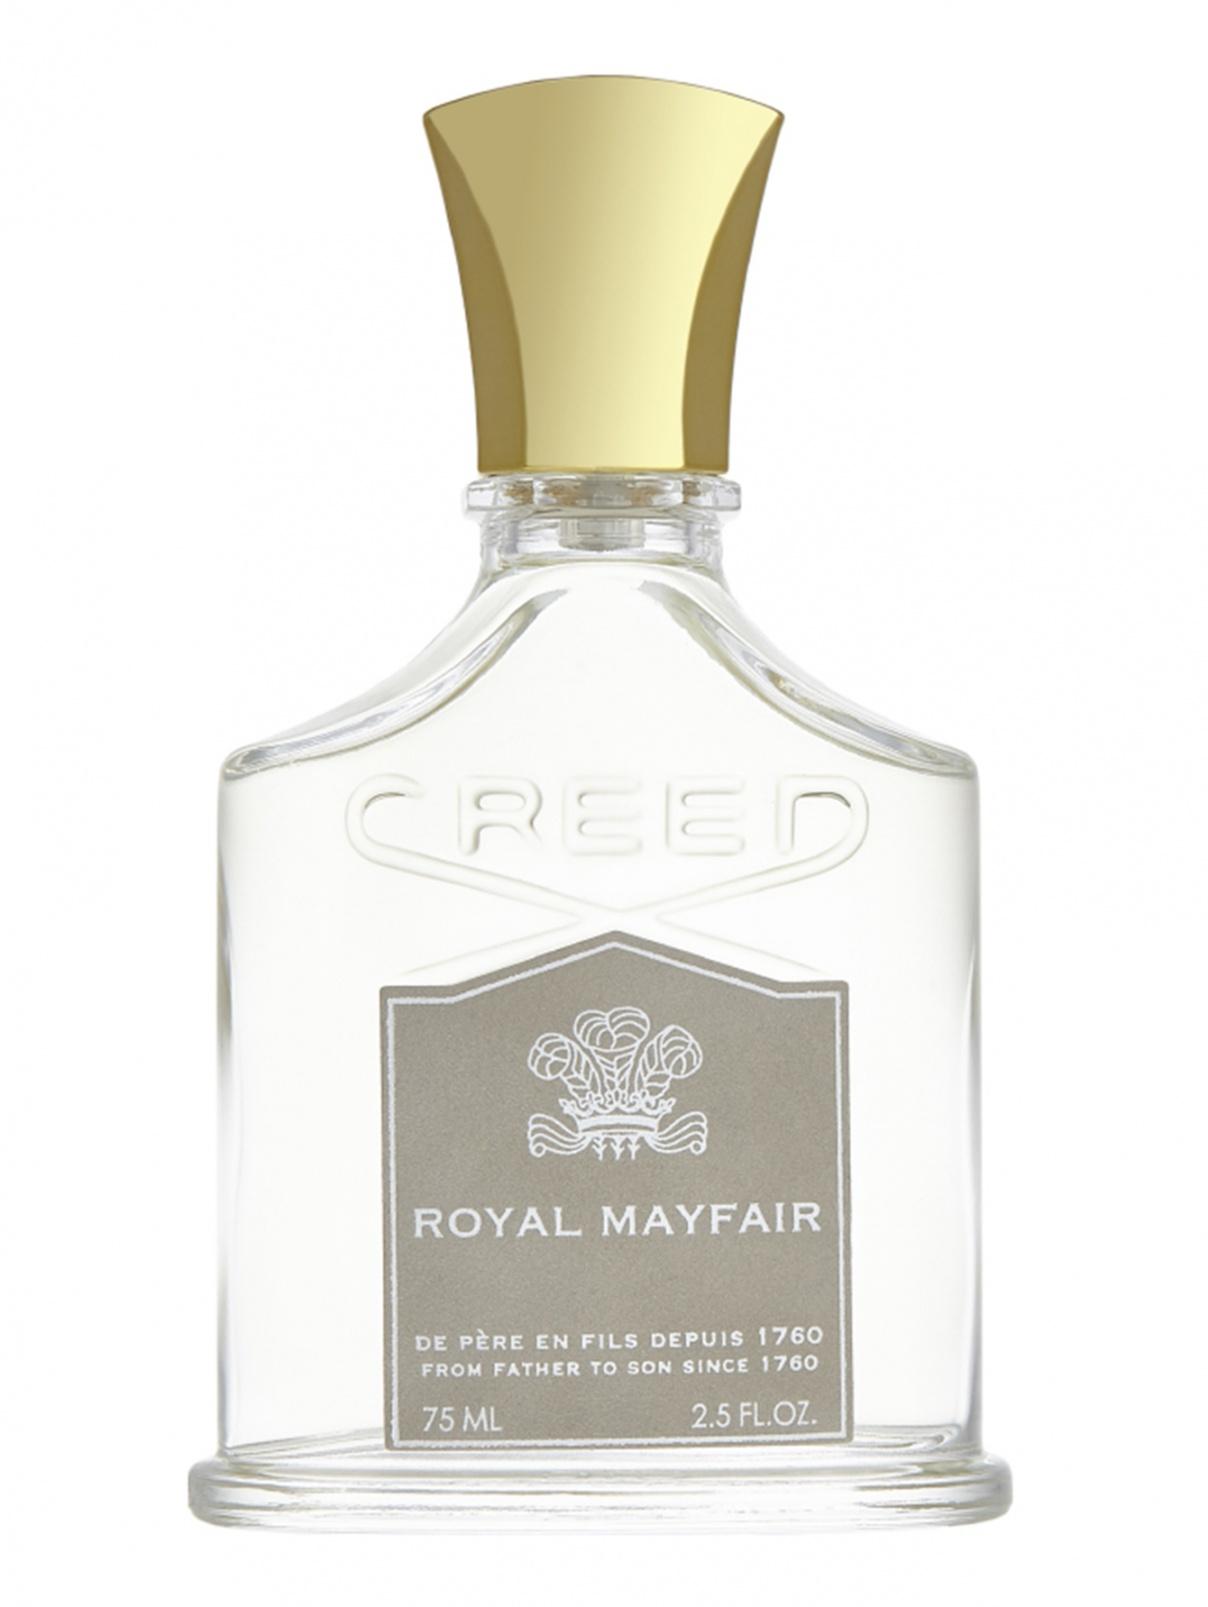 Парфюмерная вода 75 мл Royal Mayfair Creed  –  Общий вид